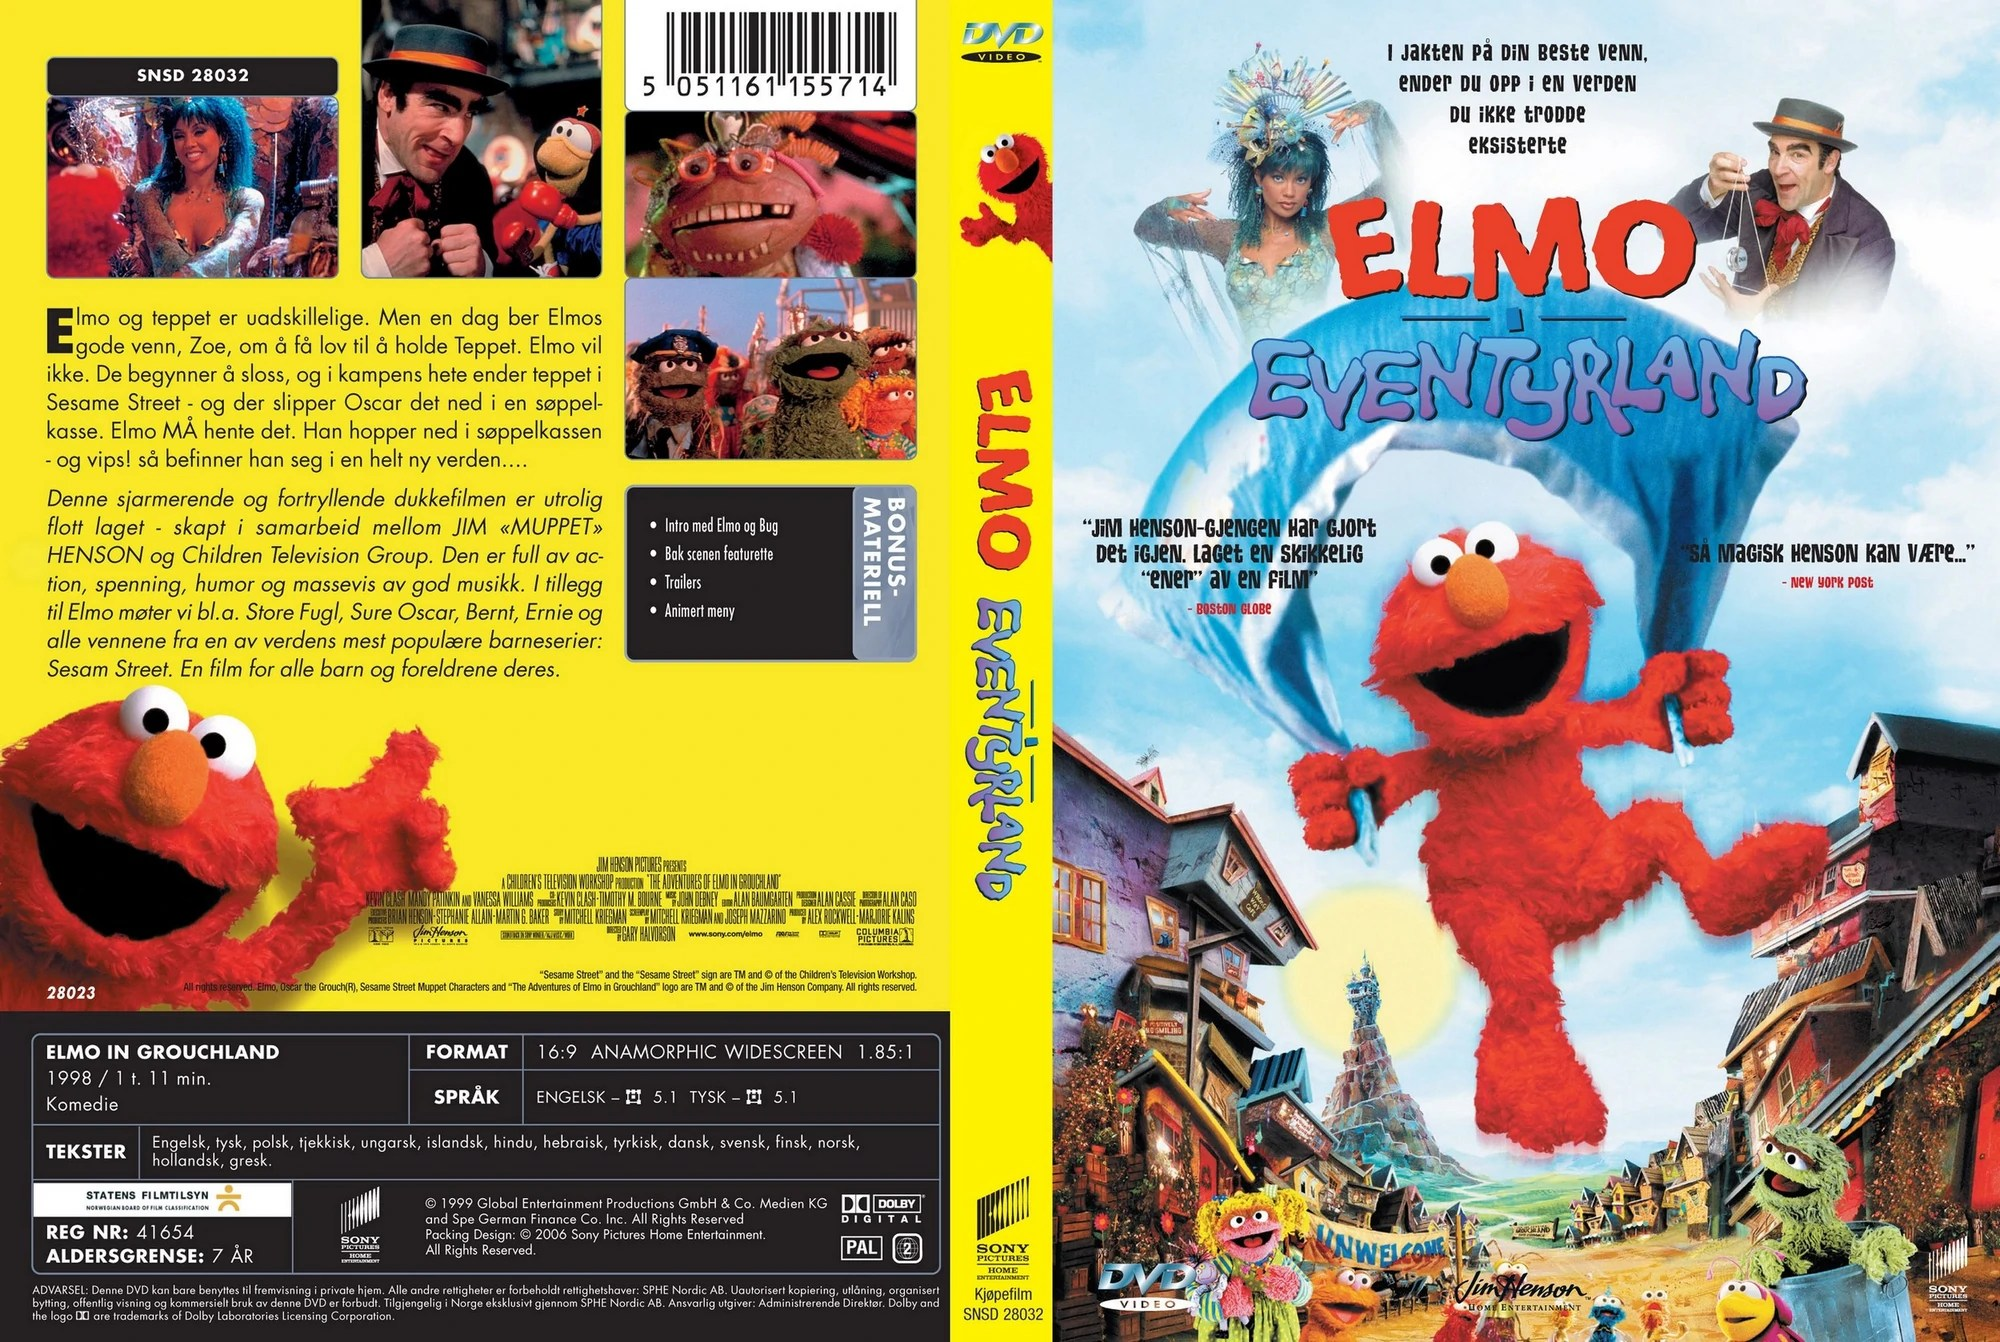 Ernie Bert Adventures Of Elmo In Grouchland 1999 - Year of